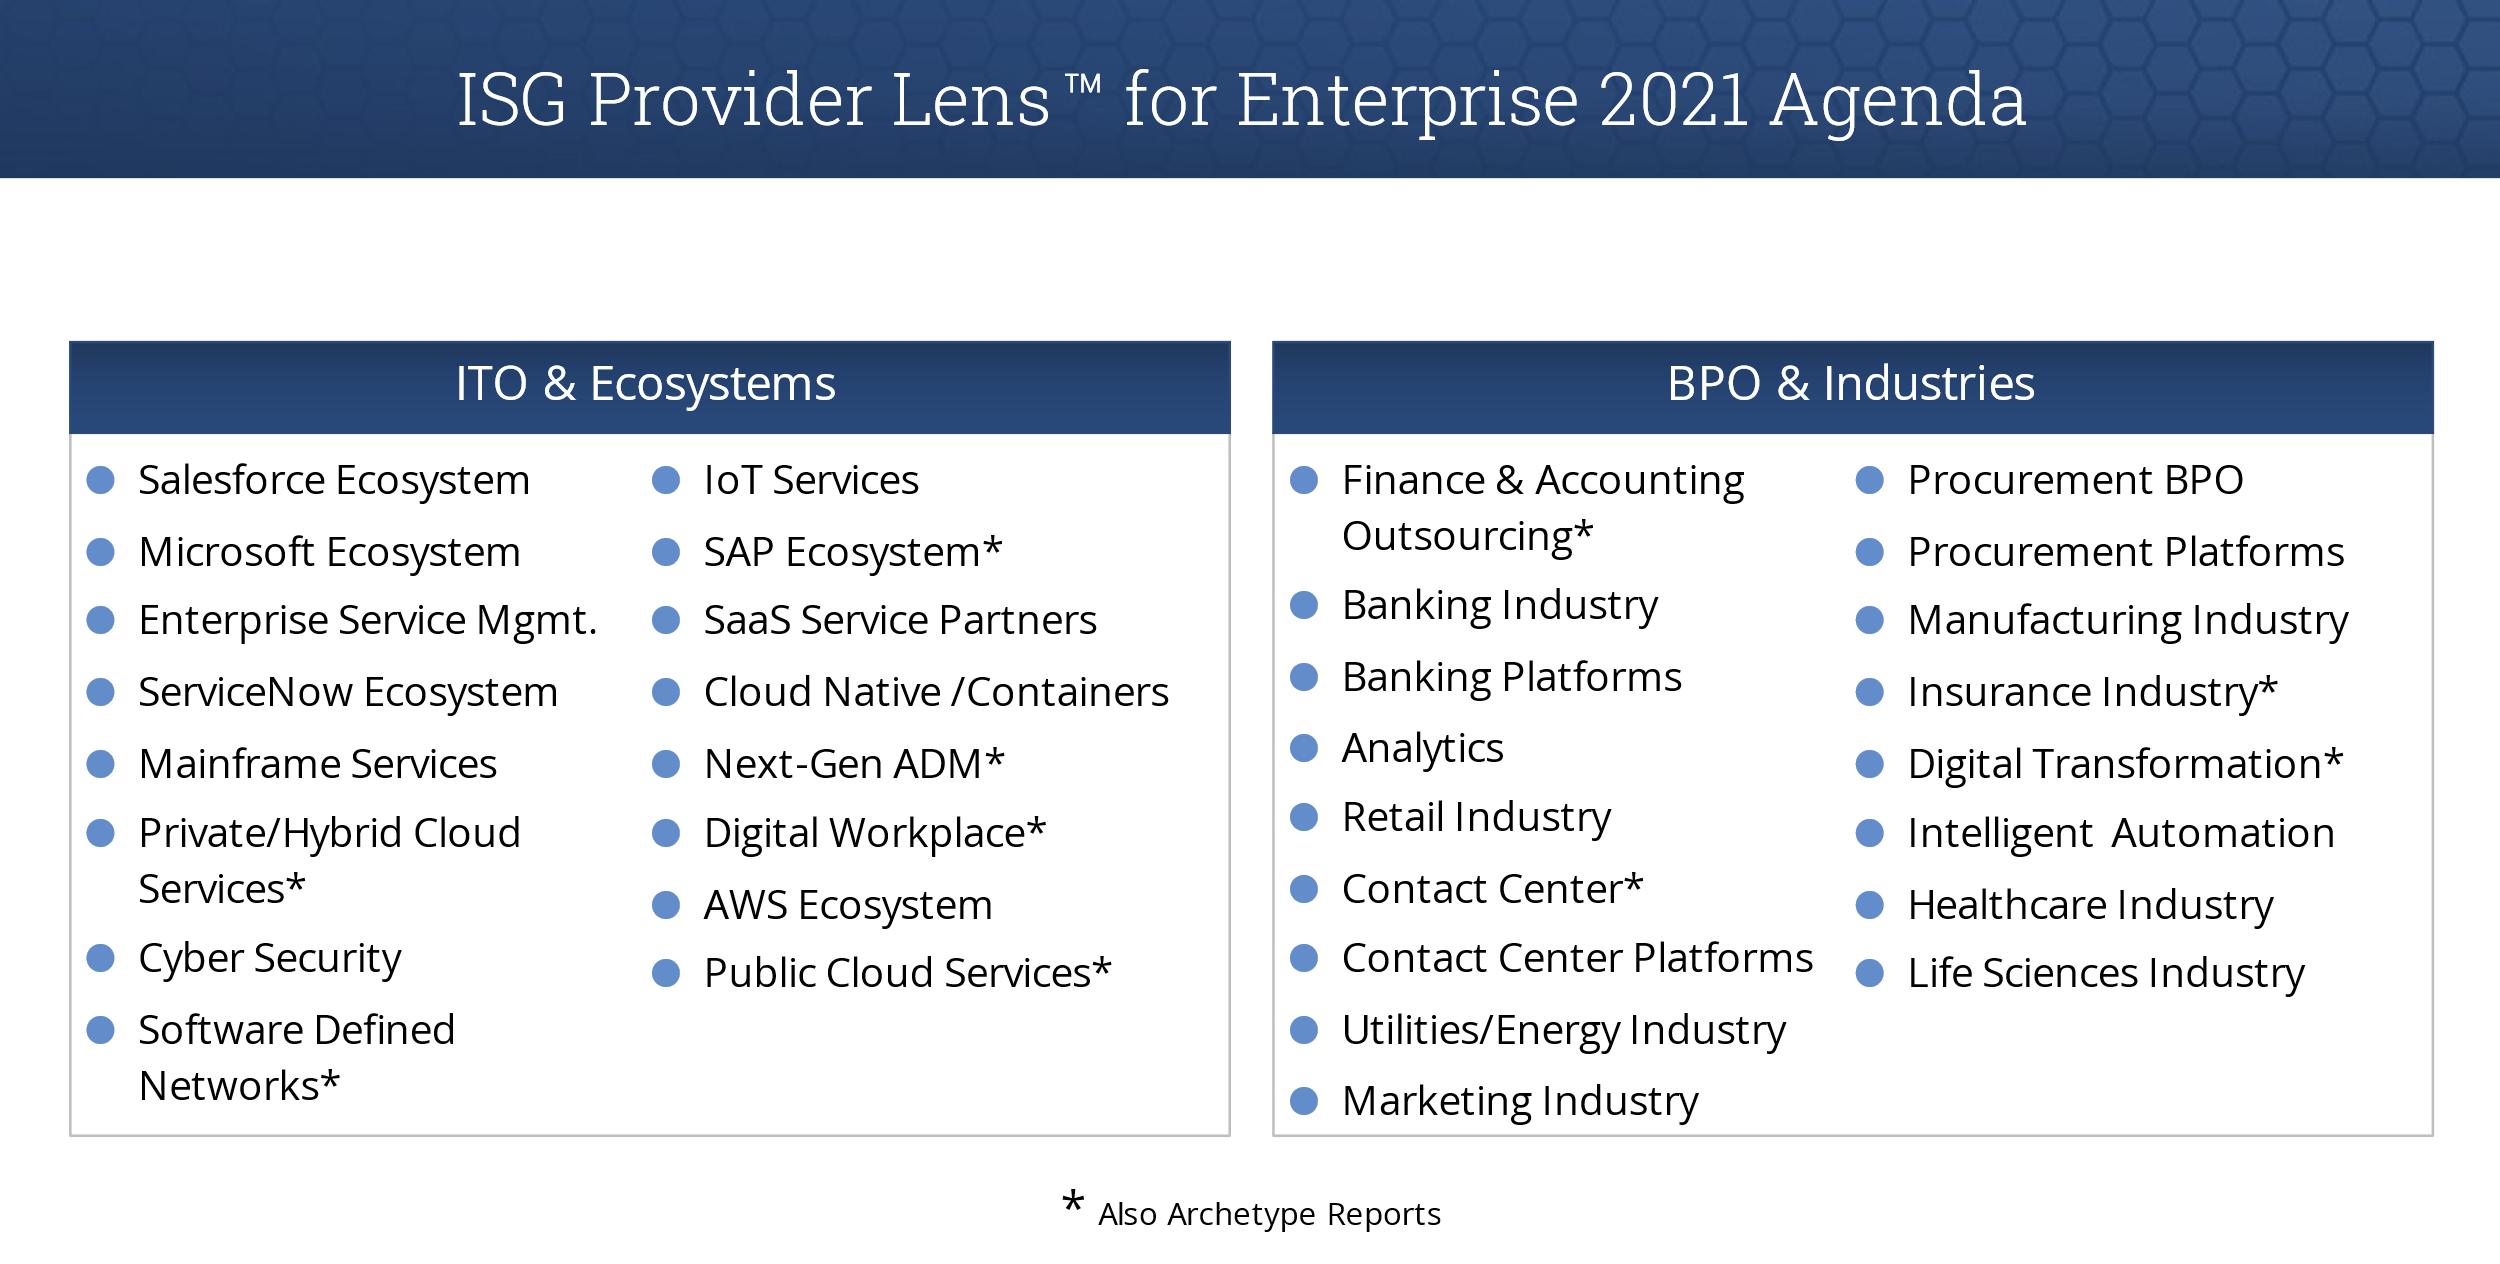 IPL-Enterprise-Agenda-2021